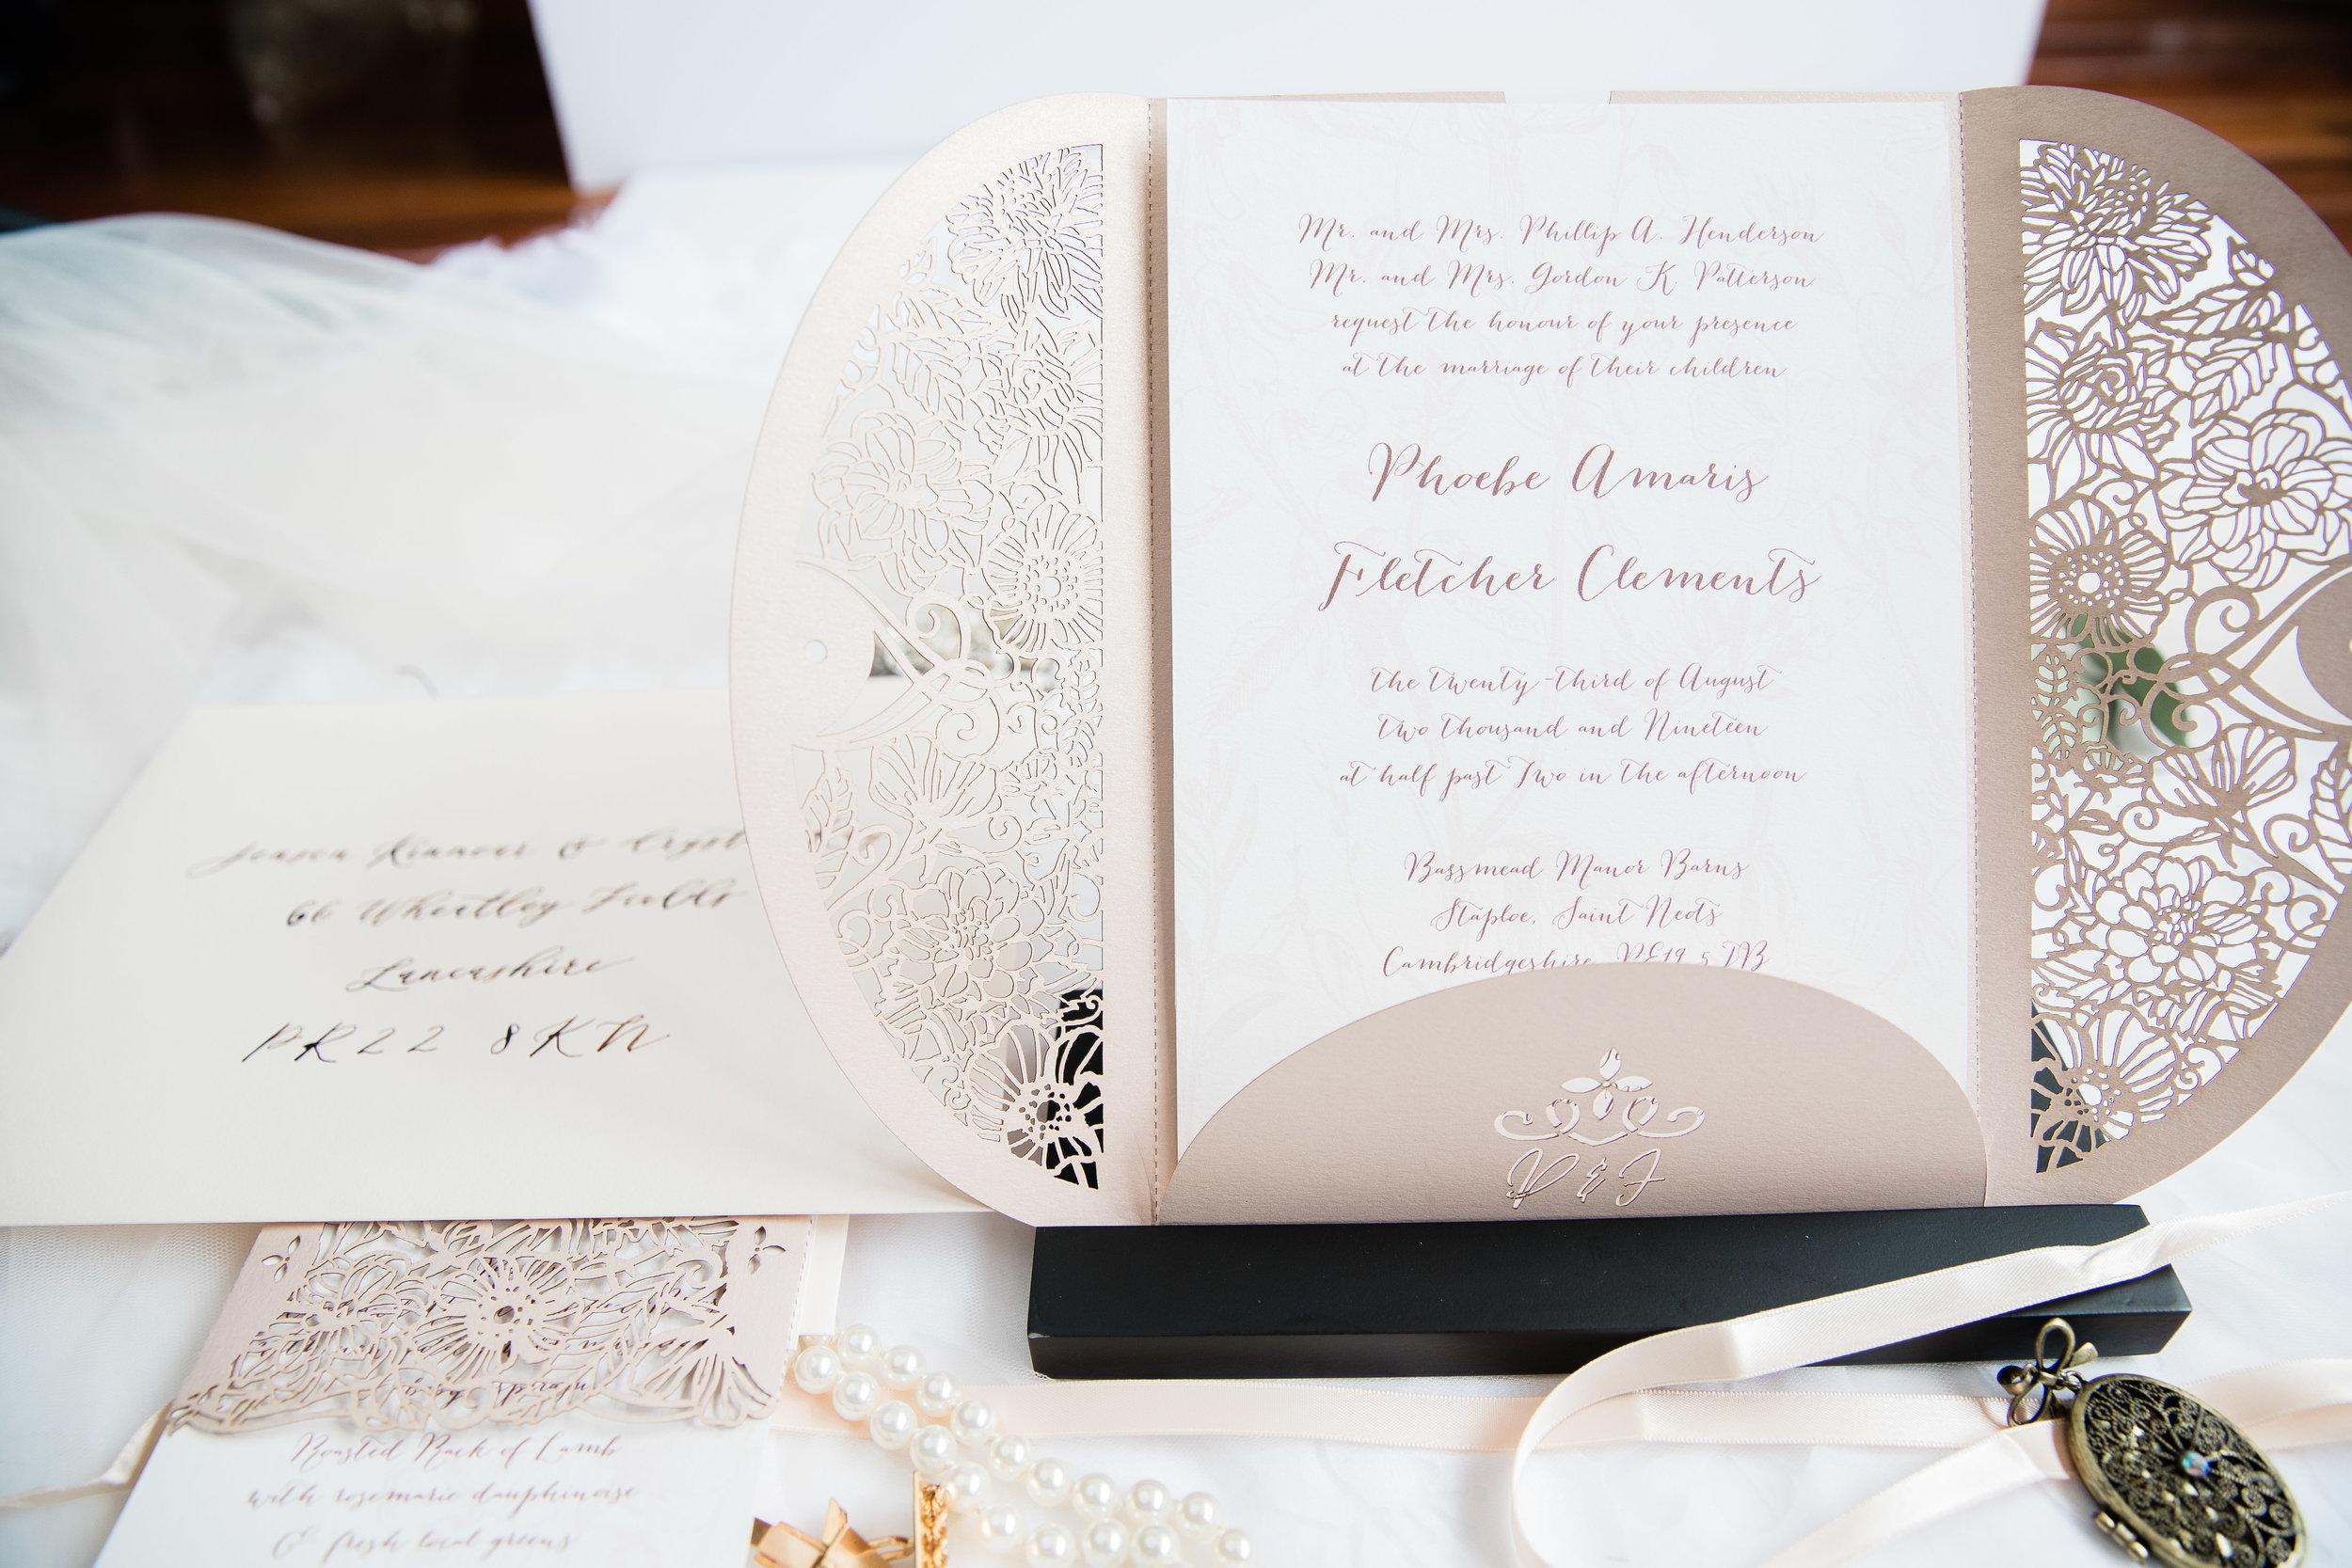 cross-eyed-fox-invitations-viviana-podhaiski-photography-38.jpg